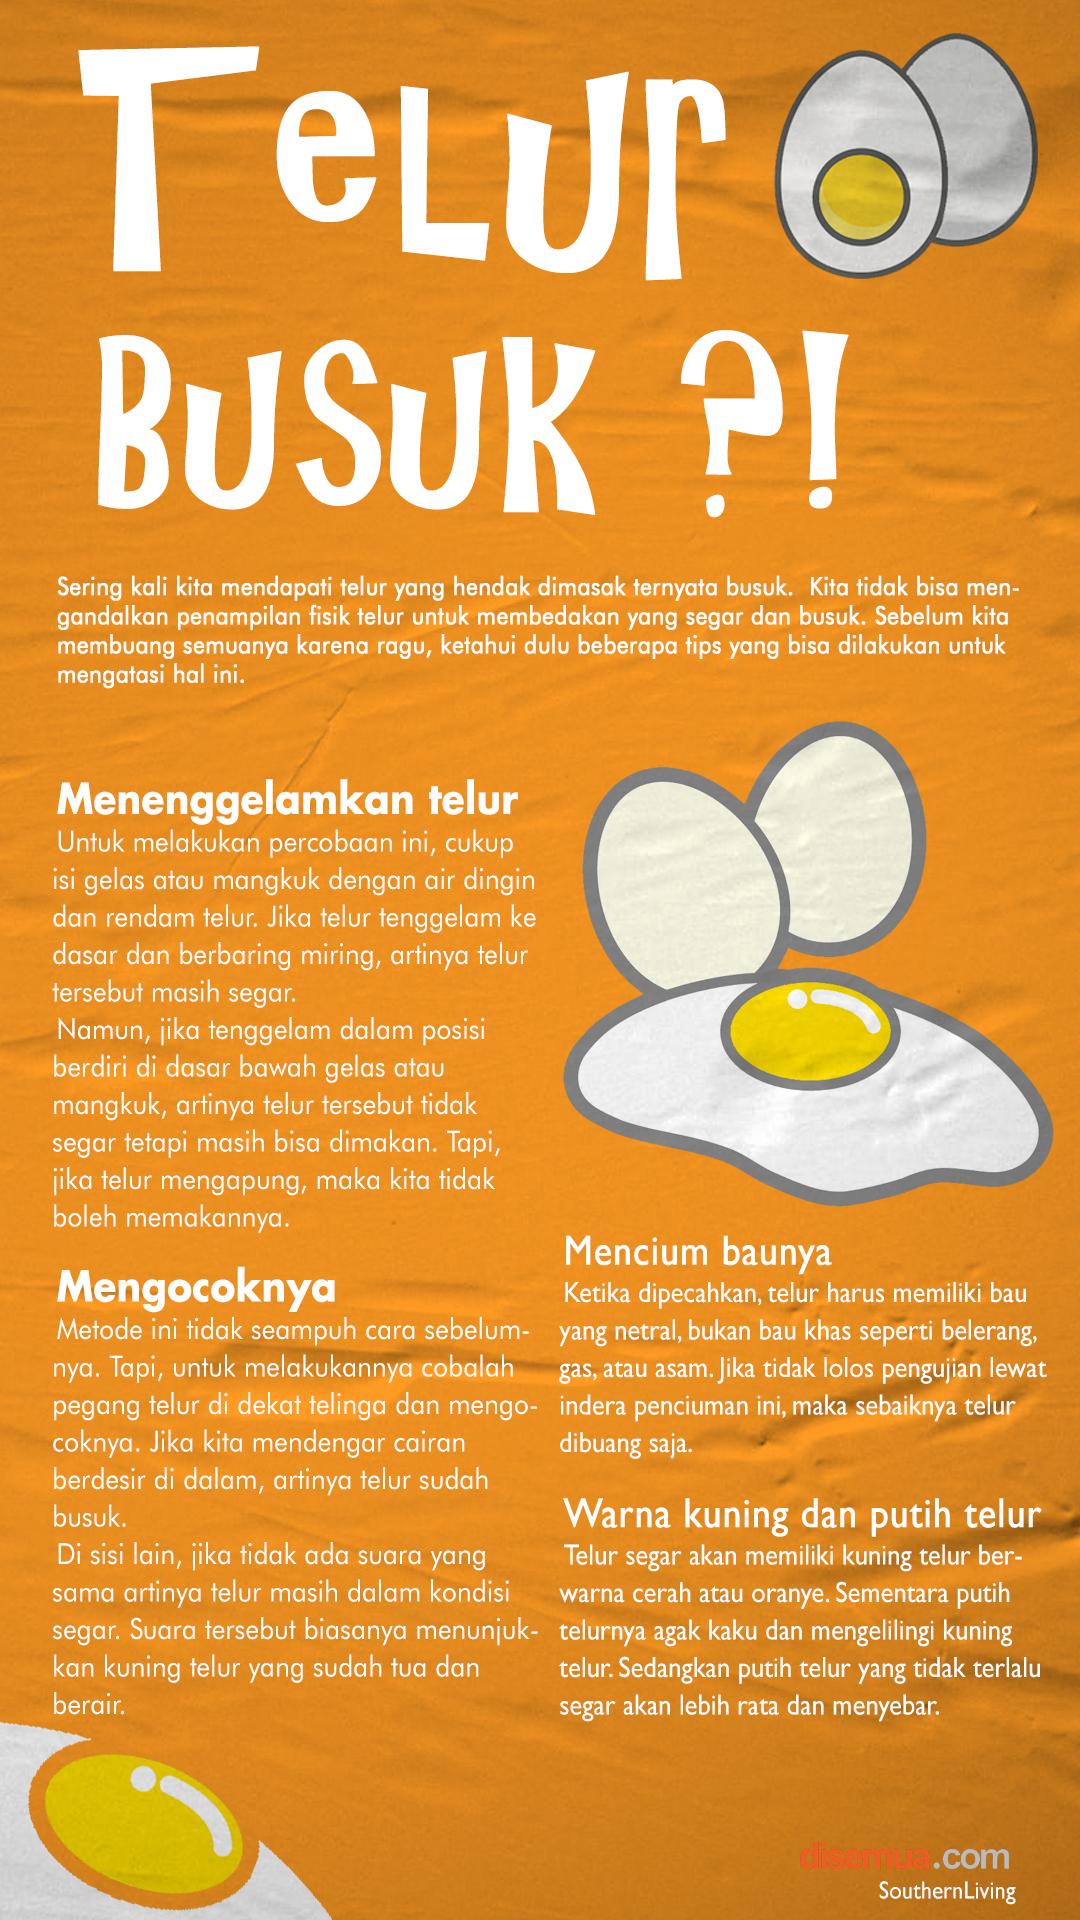 Cara Mengecek Telur Busuk